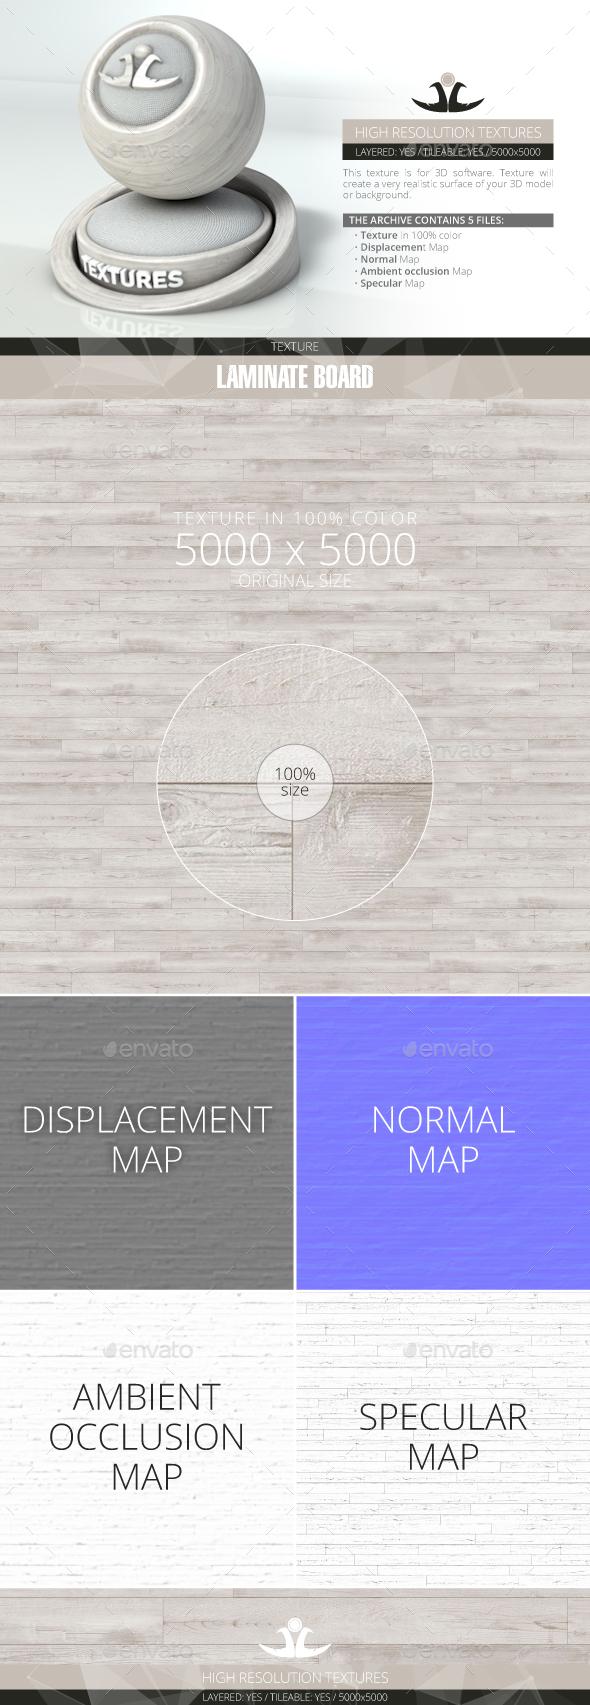 Laminate Board 79 - 3DOcean Item for Sale